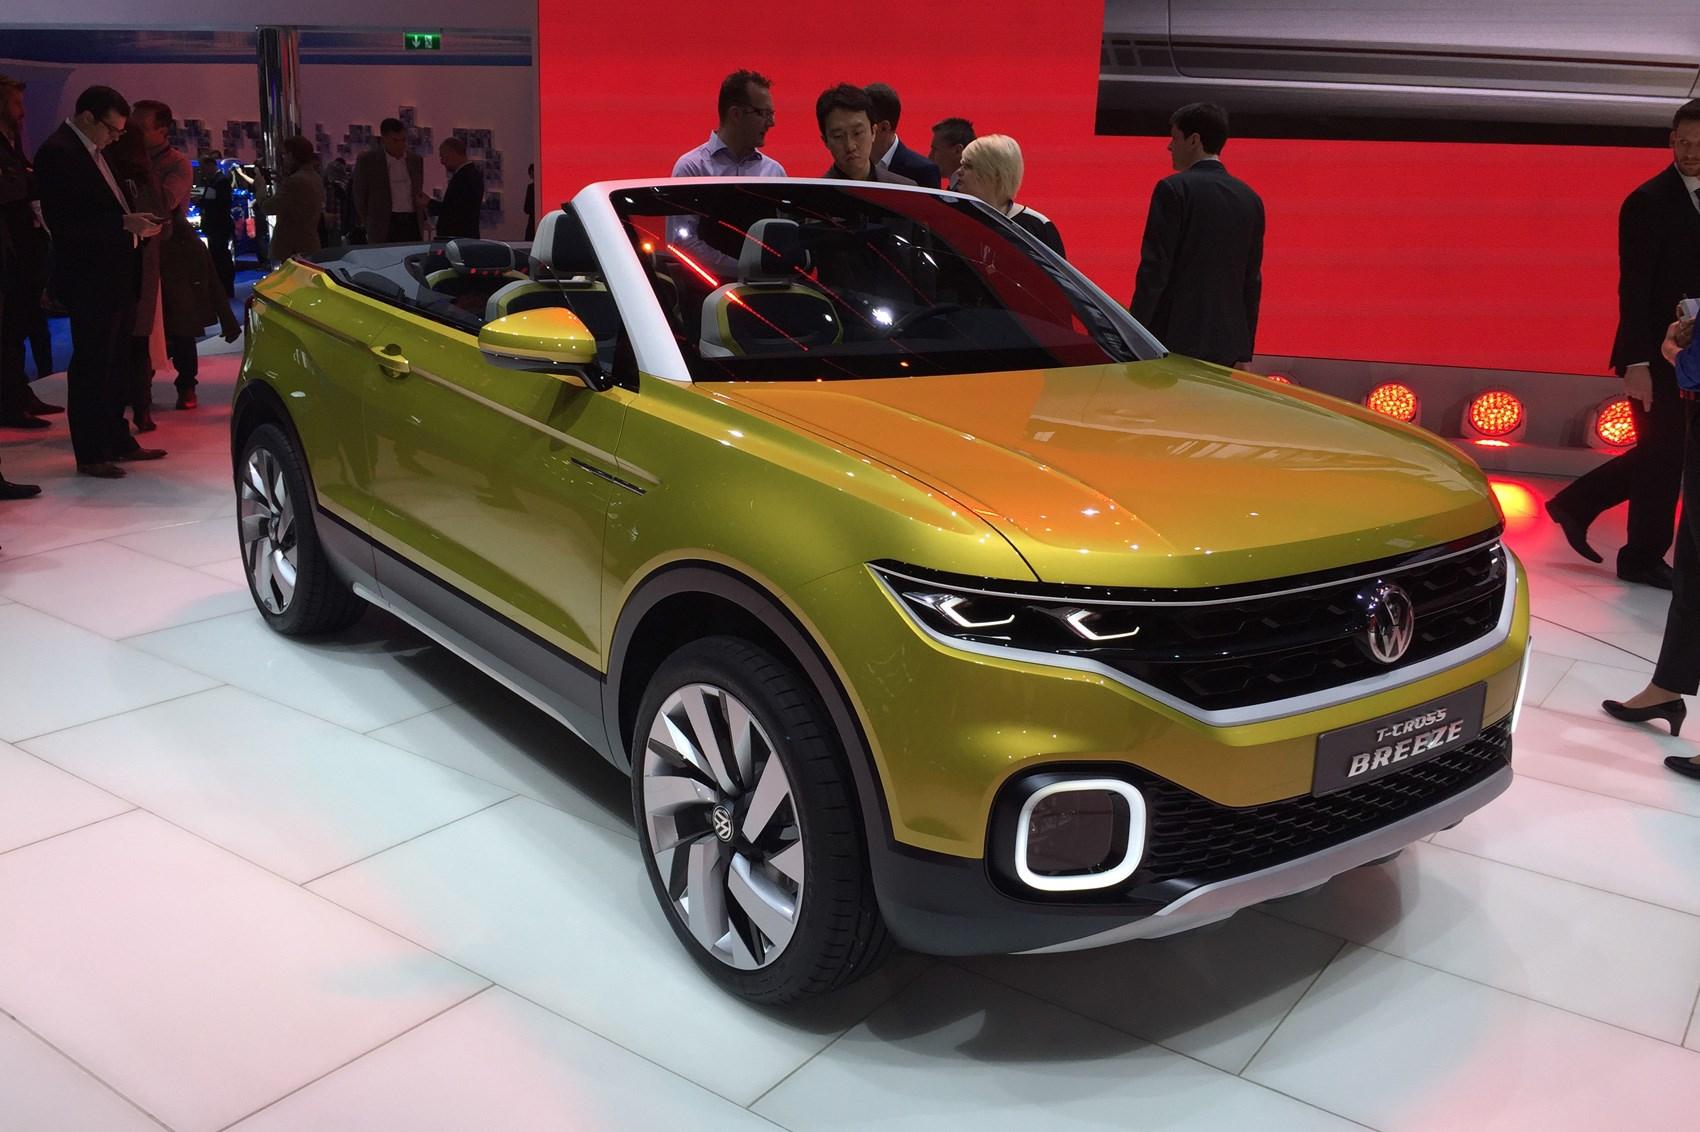 Infiniti Convertible >> Volkswagen T-Cross Breeze concept: the compact Evoque convertible from VW | CAR Magazine